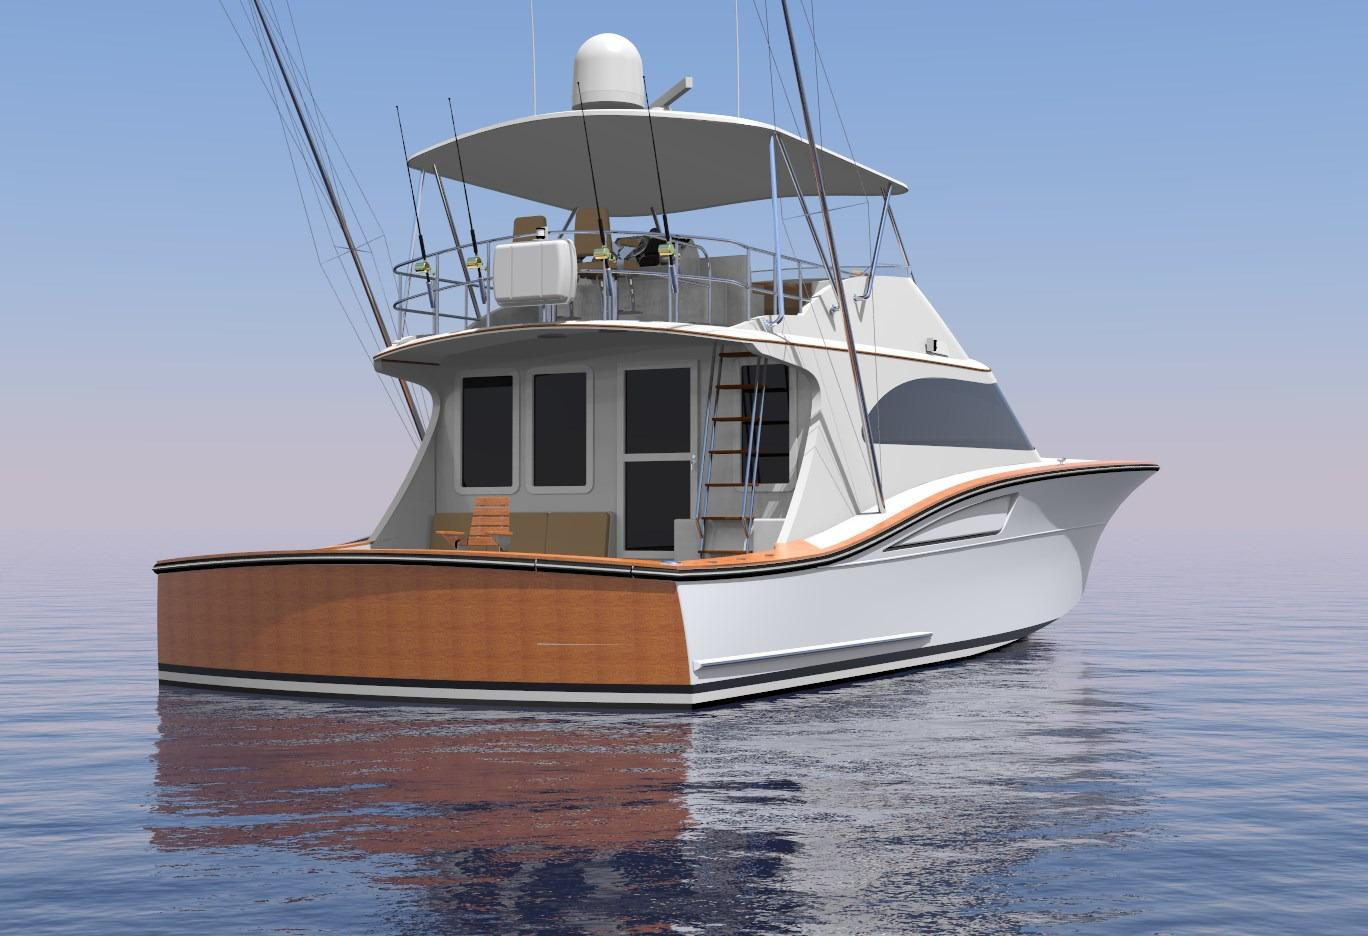 Brooklin Boat Yard 65 Perspective Stern